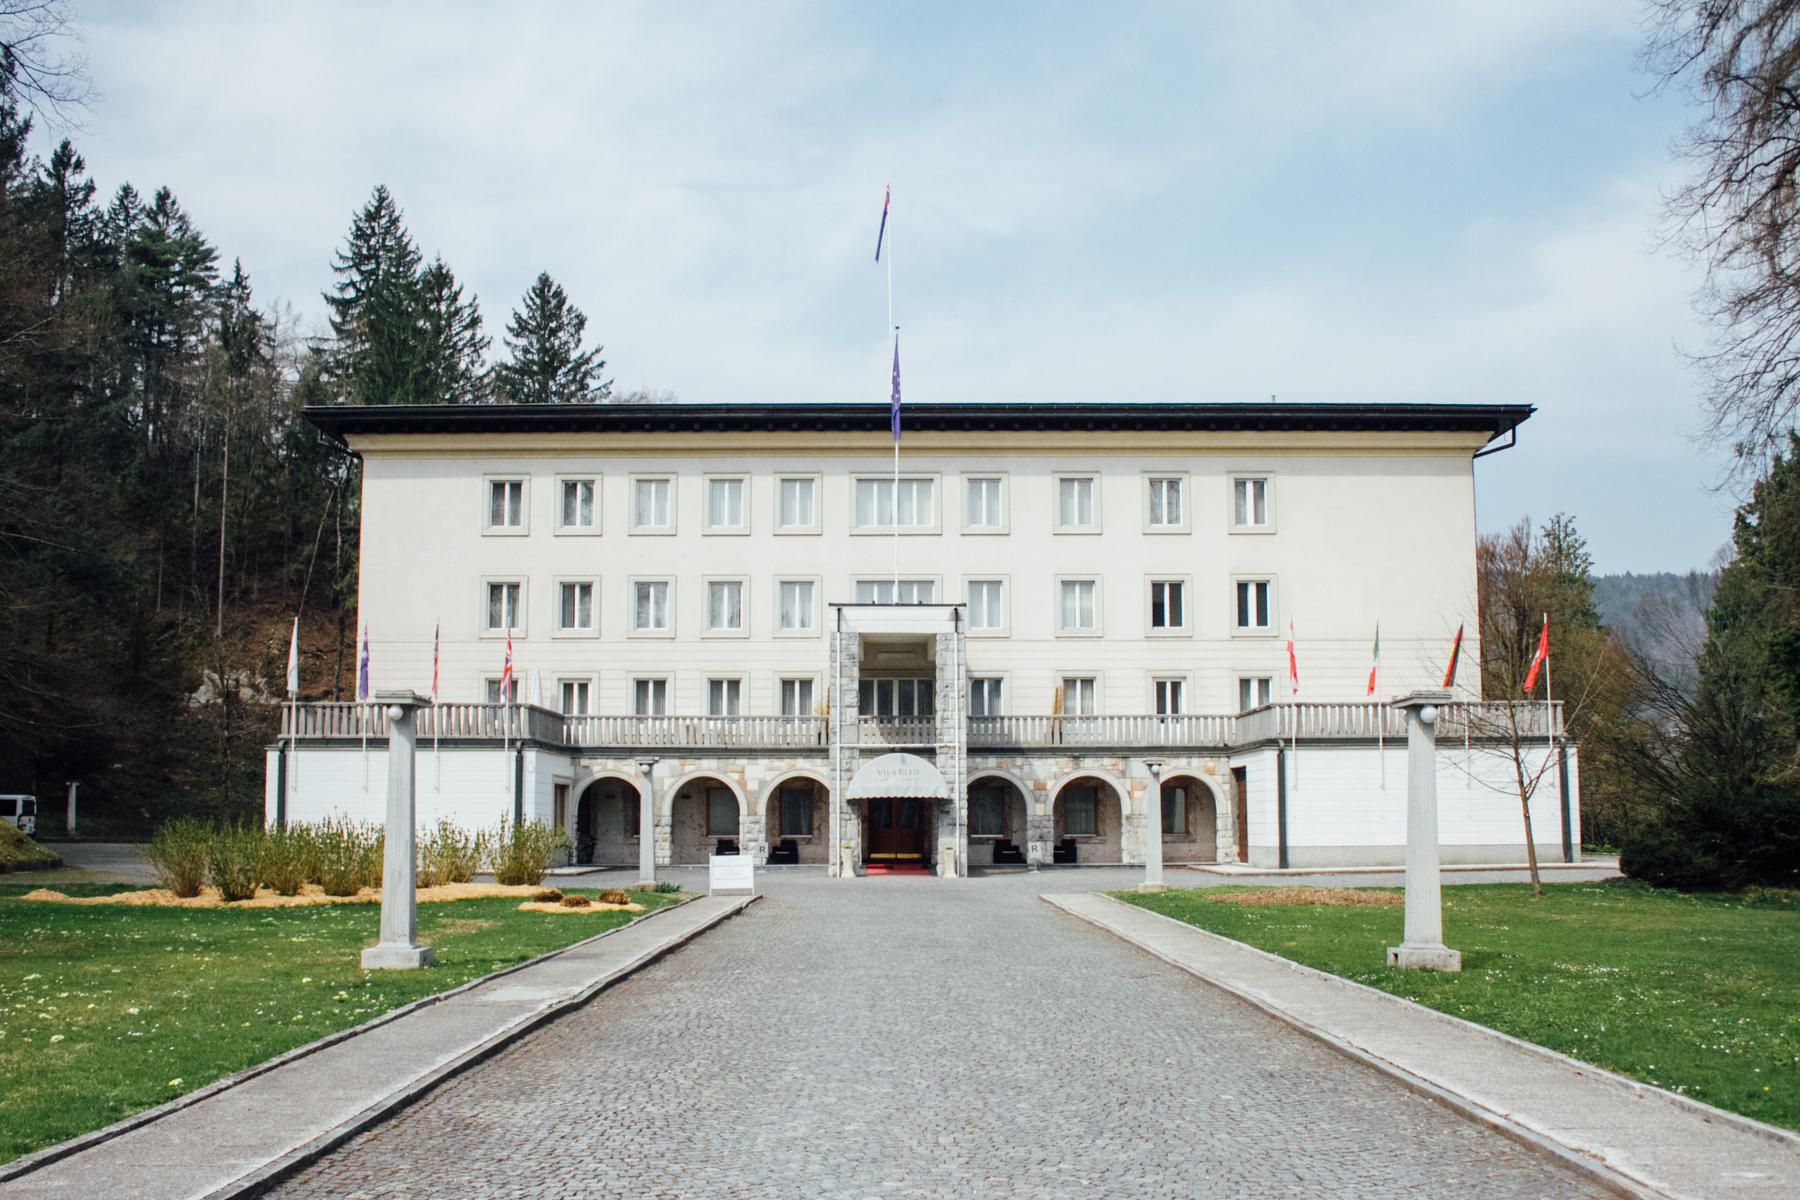 The Vila Bled Hotel